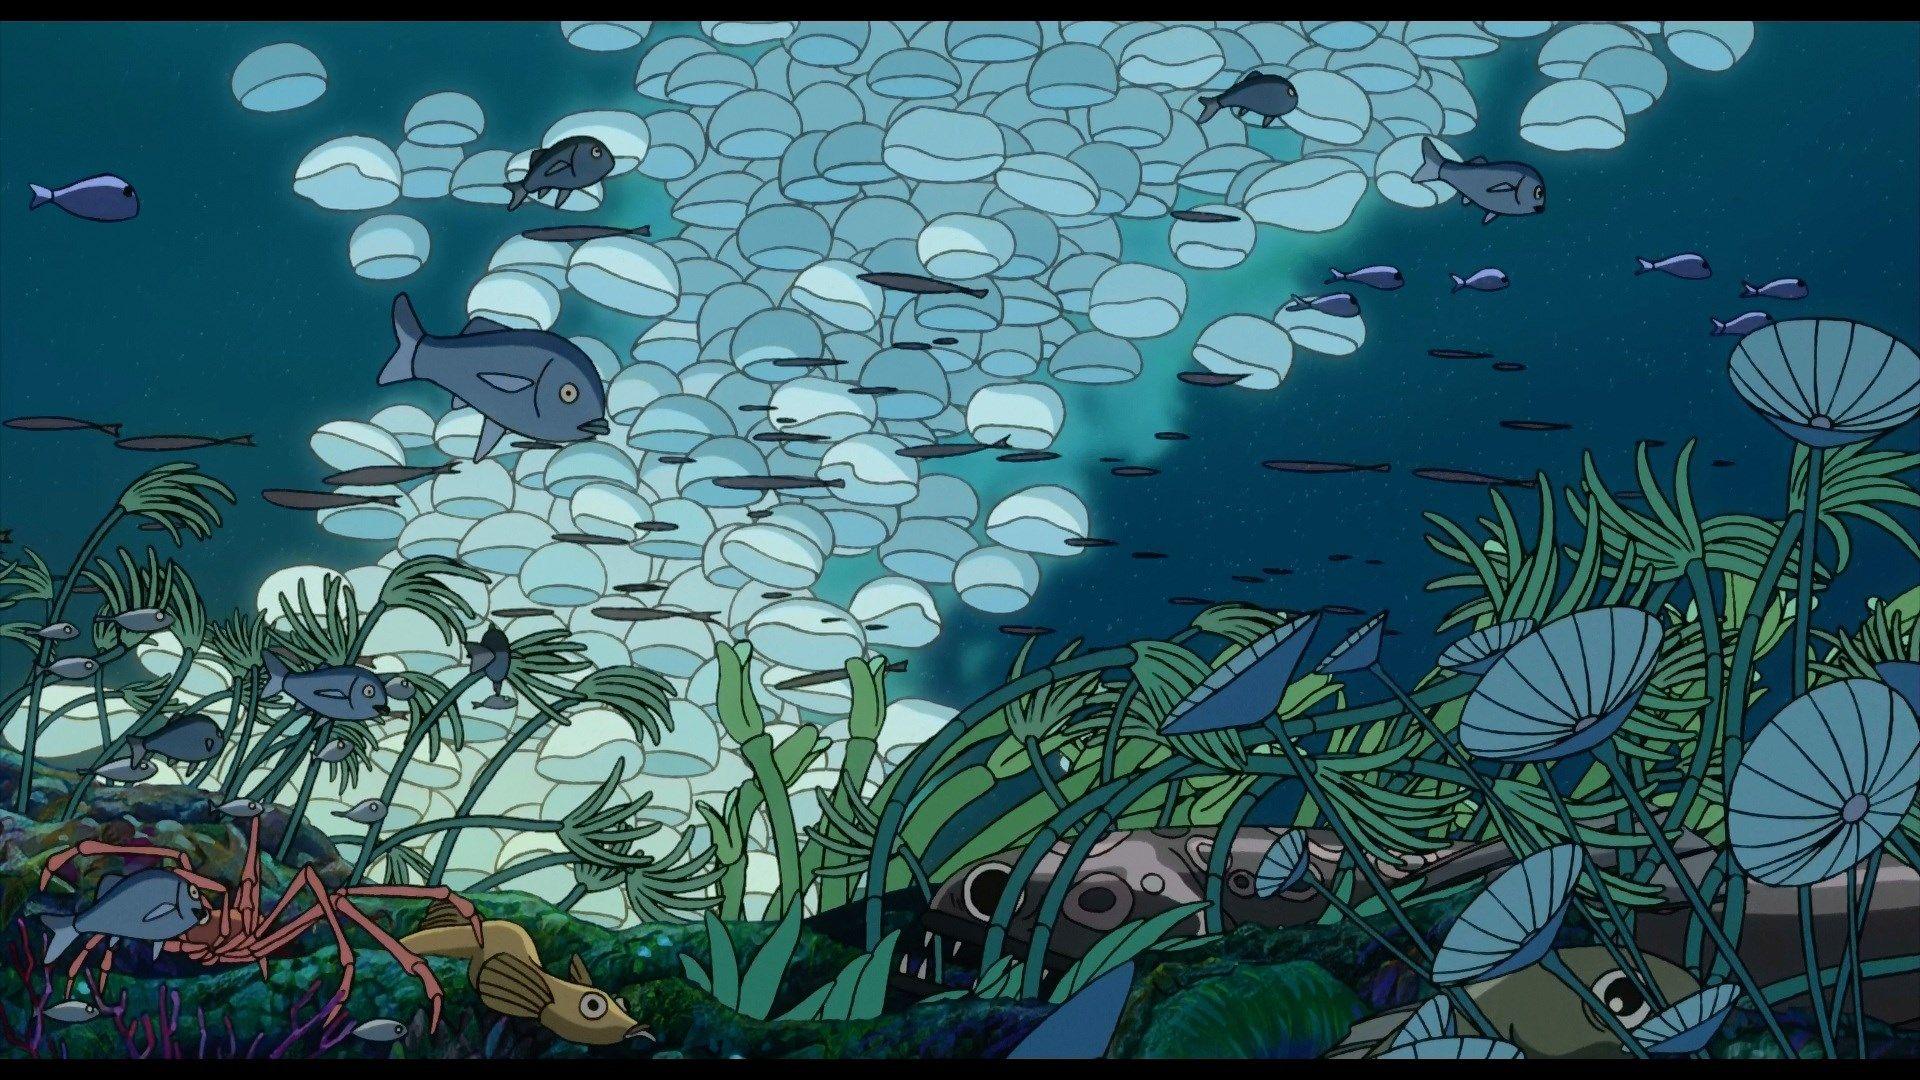 Beautiful Pictures Of Ponyo Studio Ghibli Art Ponyo Ghibli Art